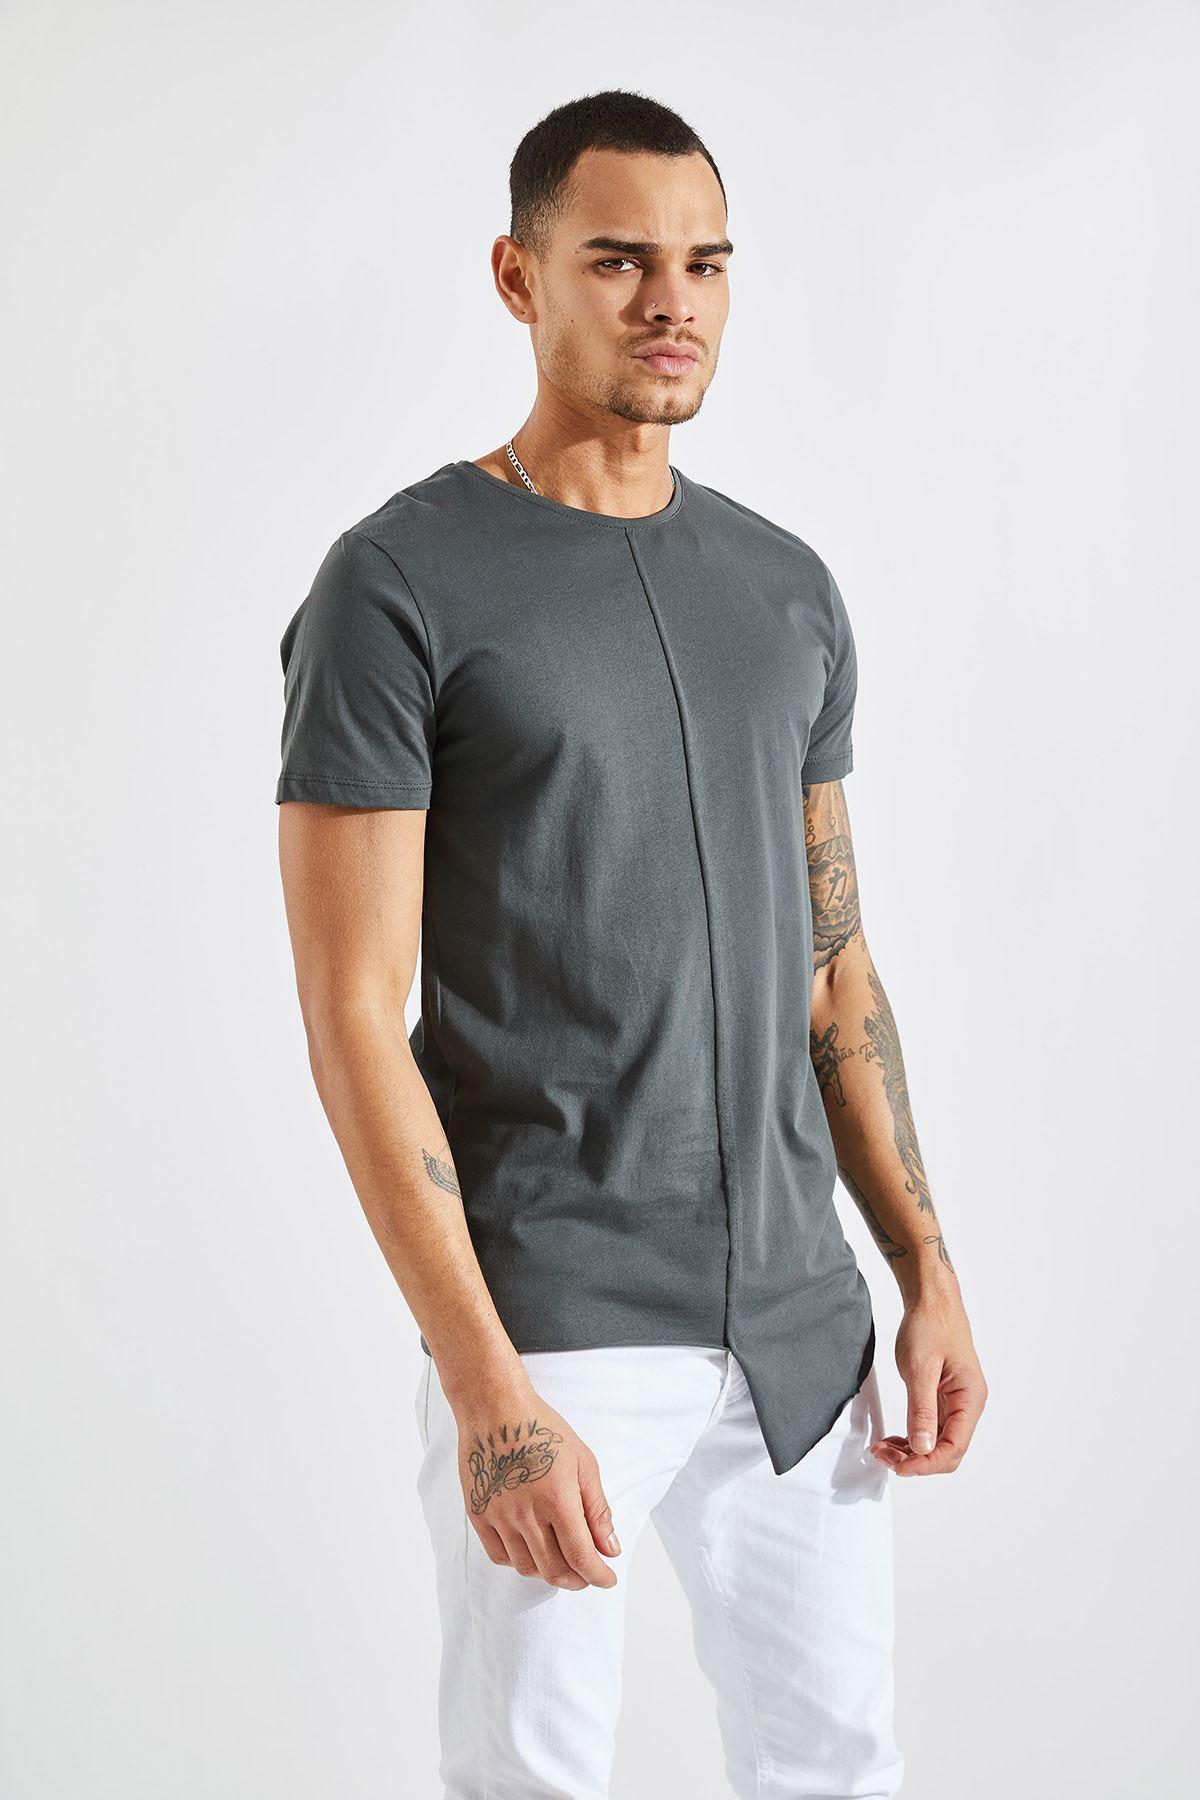 Erkek Önü Parçalı Asimetrik Füme T-Shirt